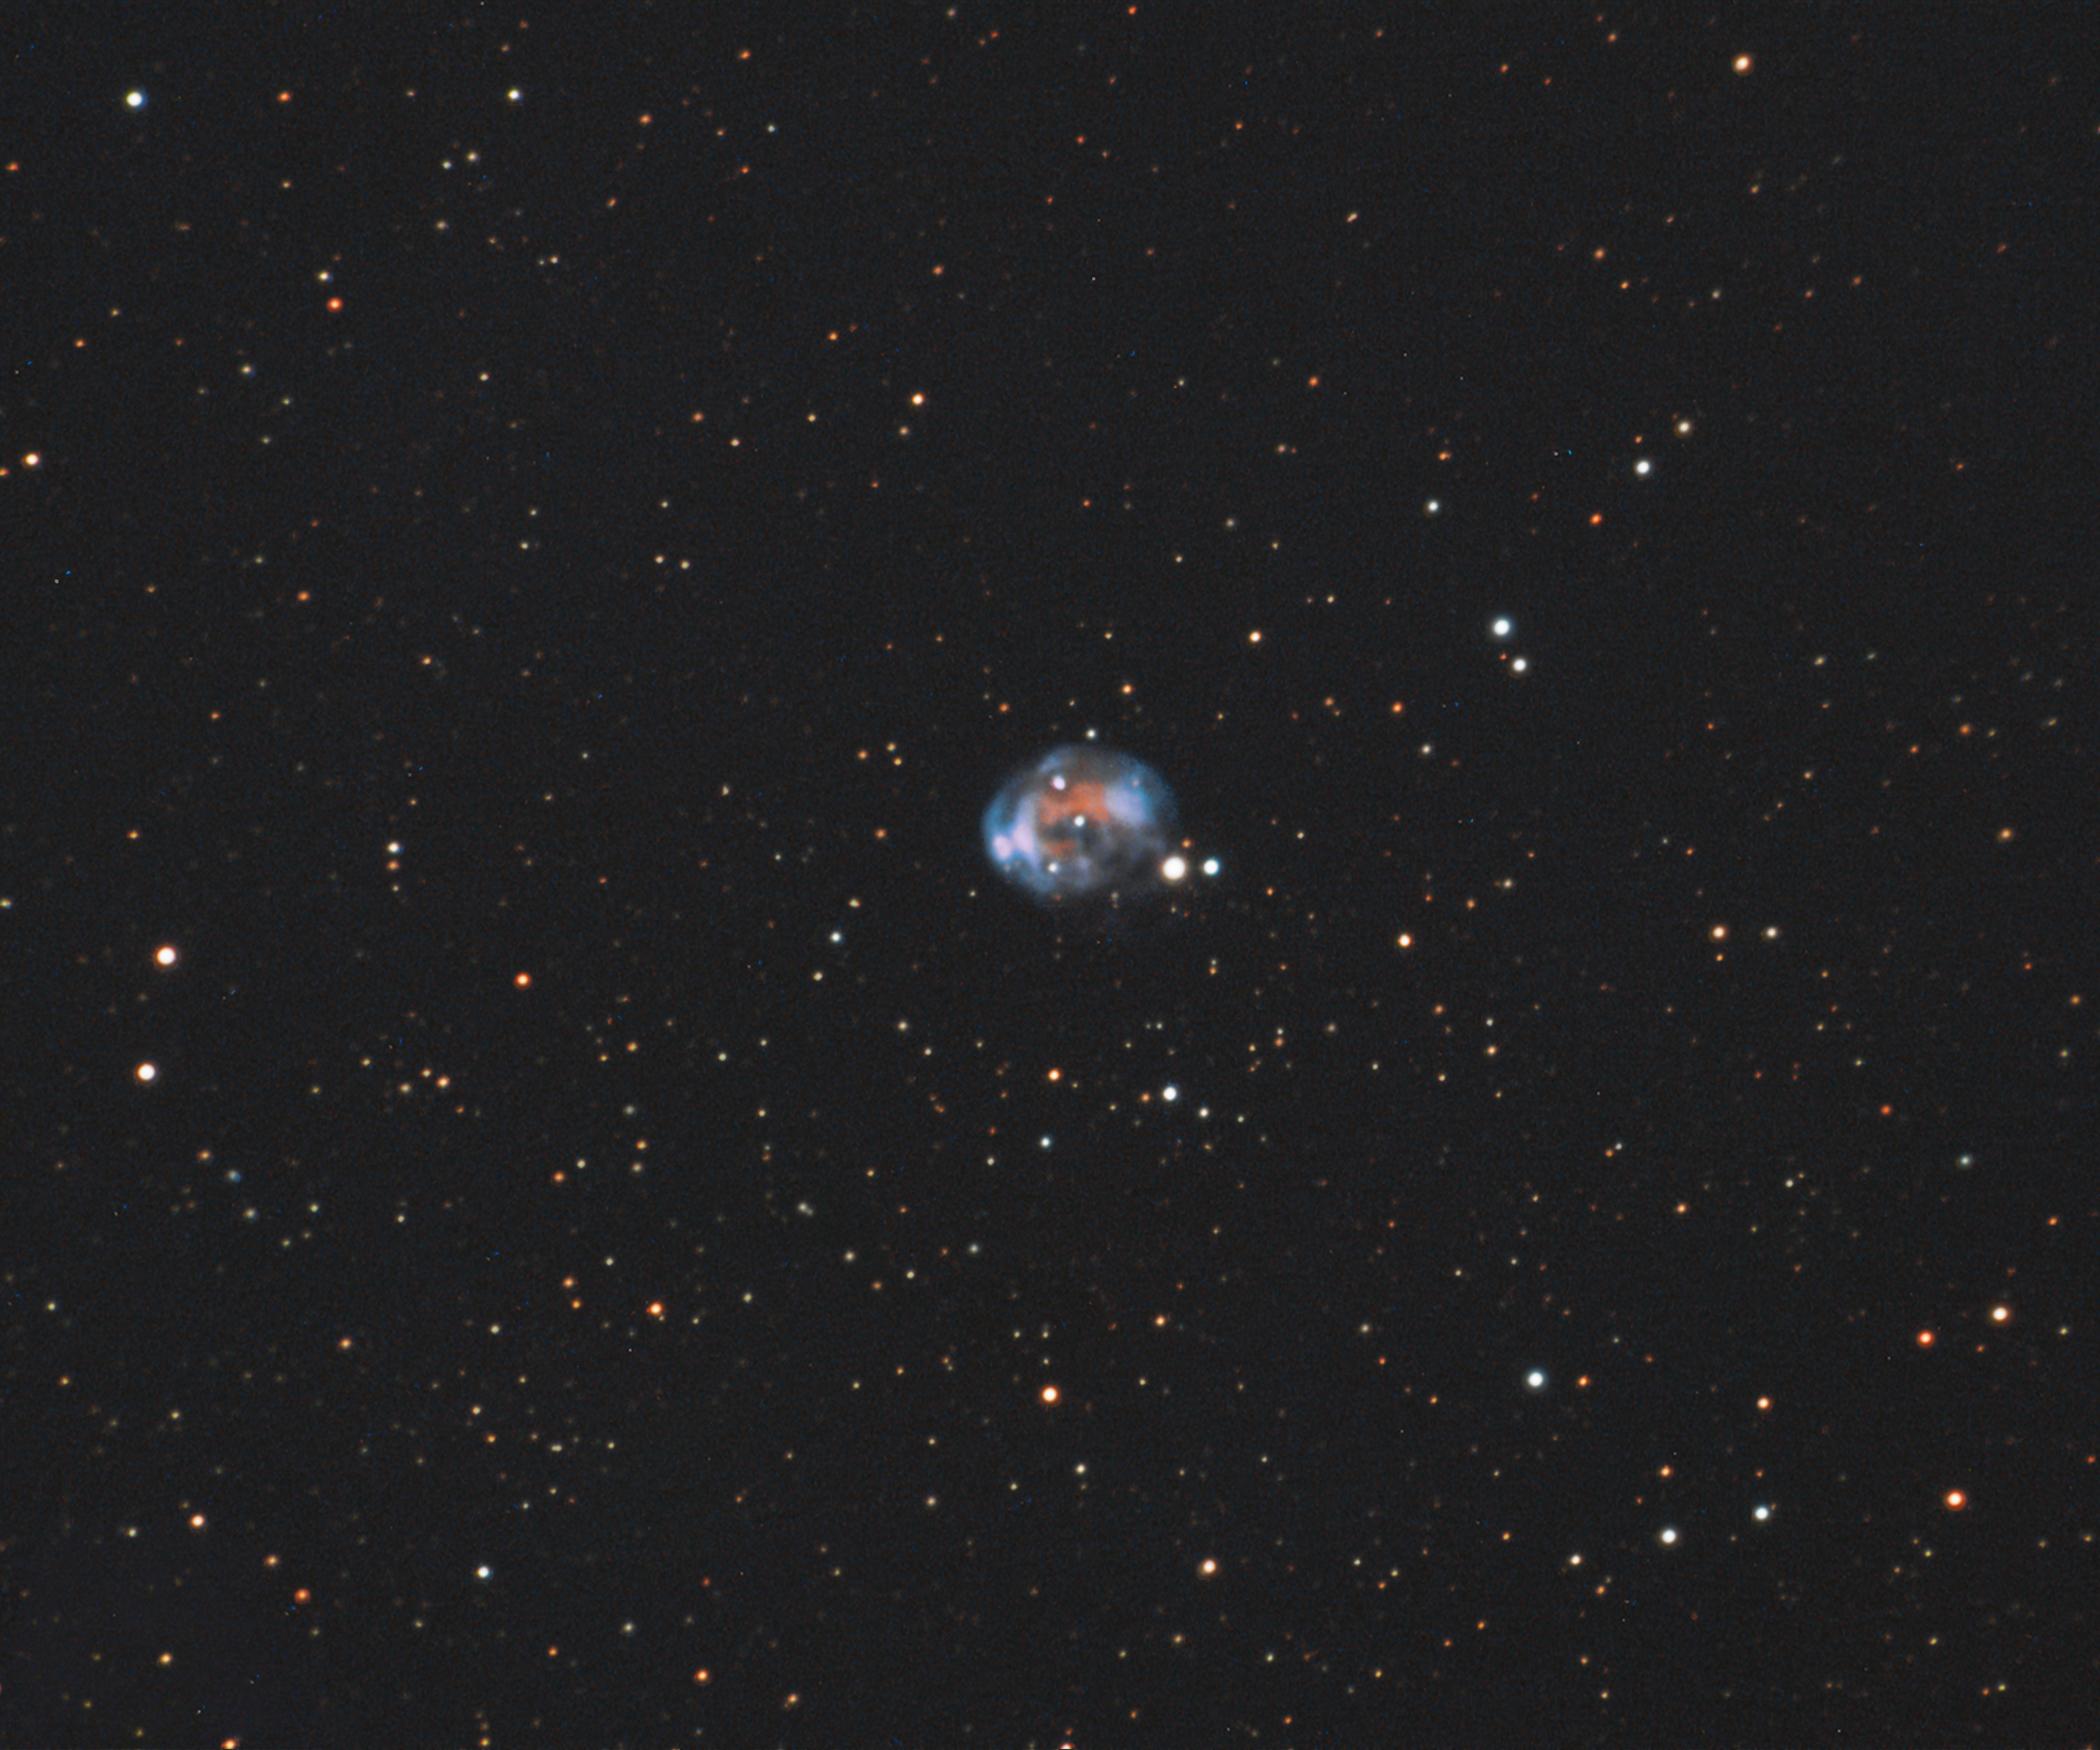 The Fetus Nebula, a planetary nebula in Cygnus